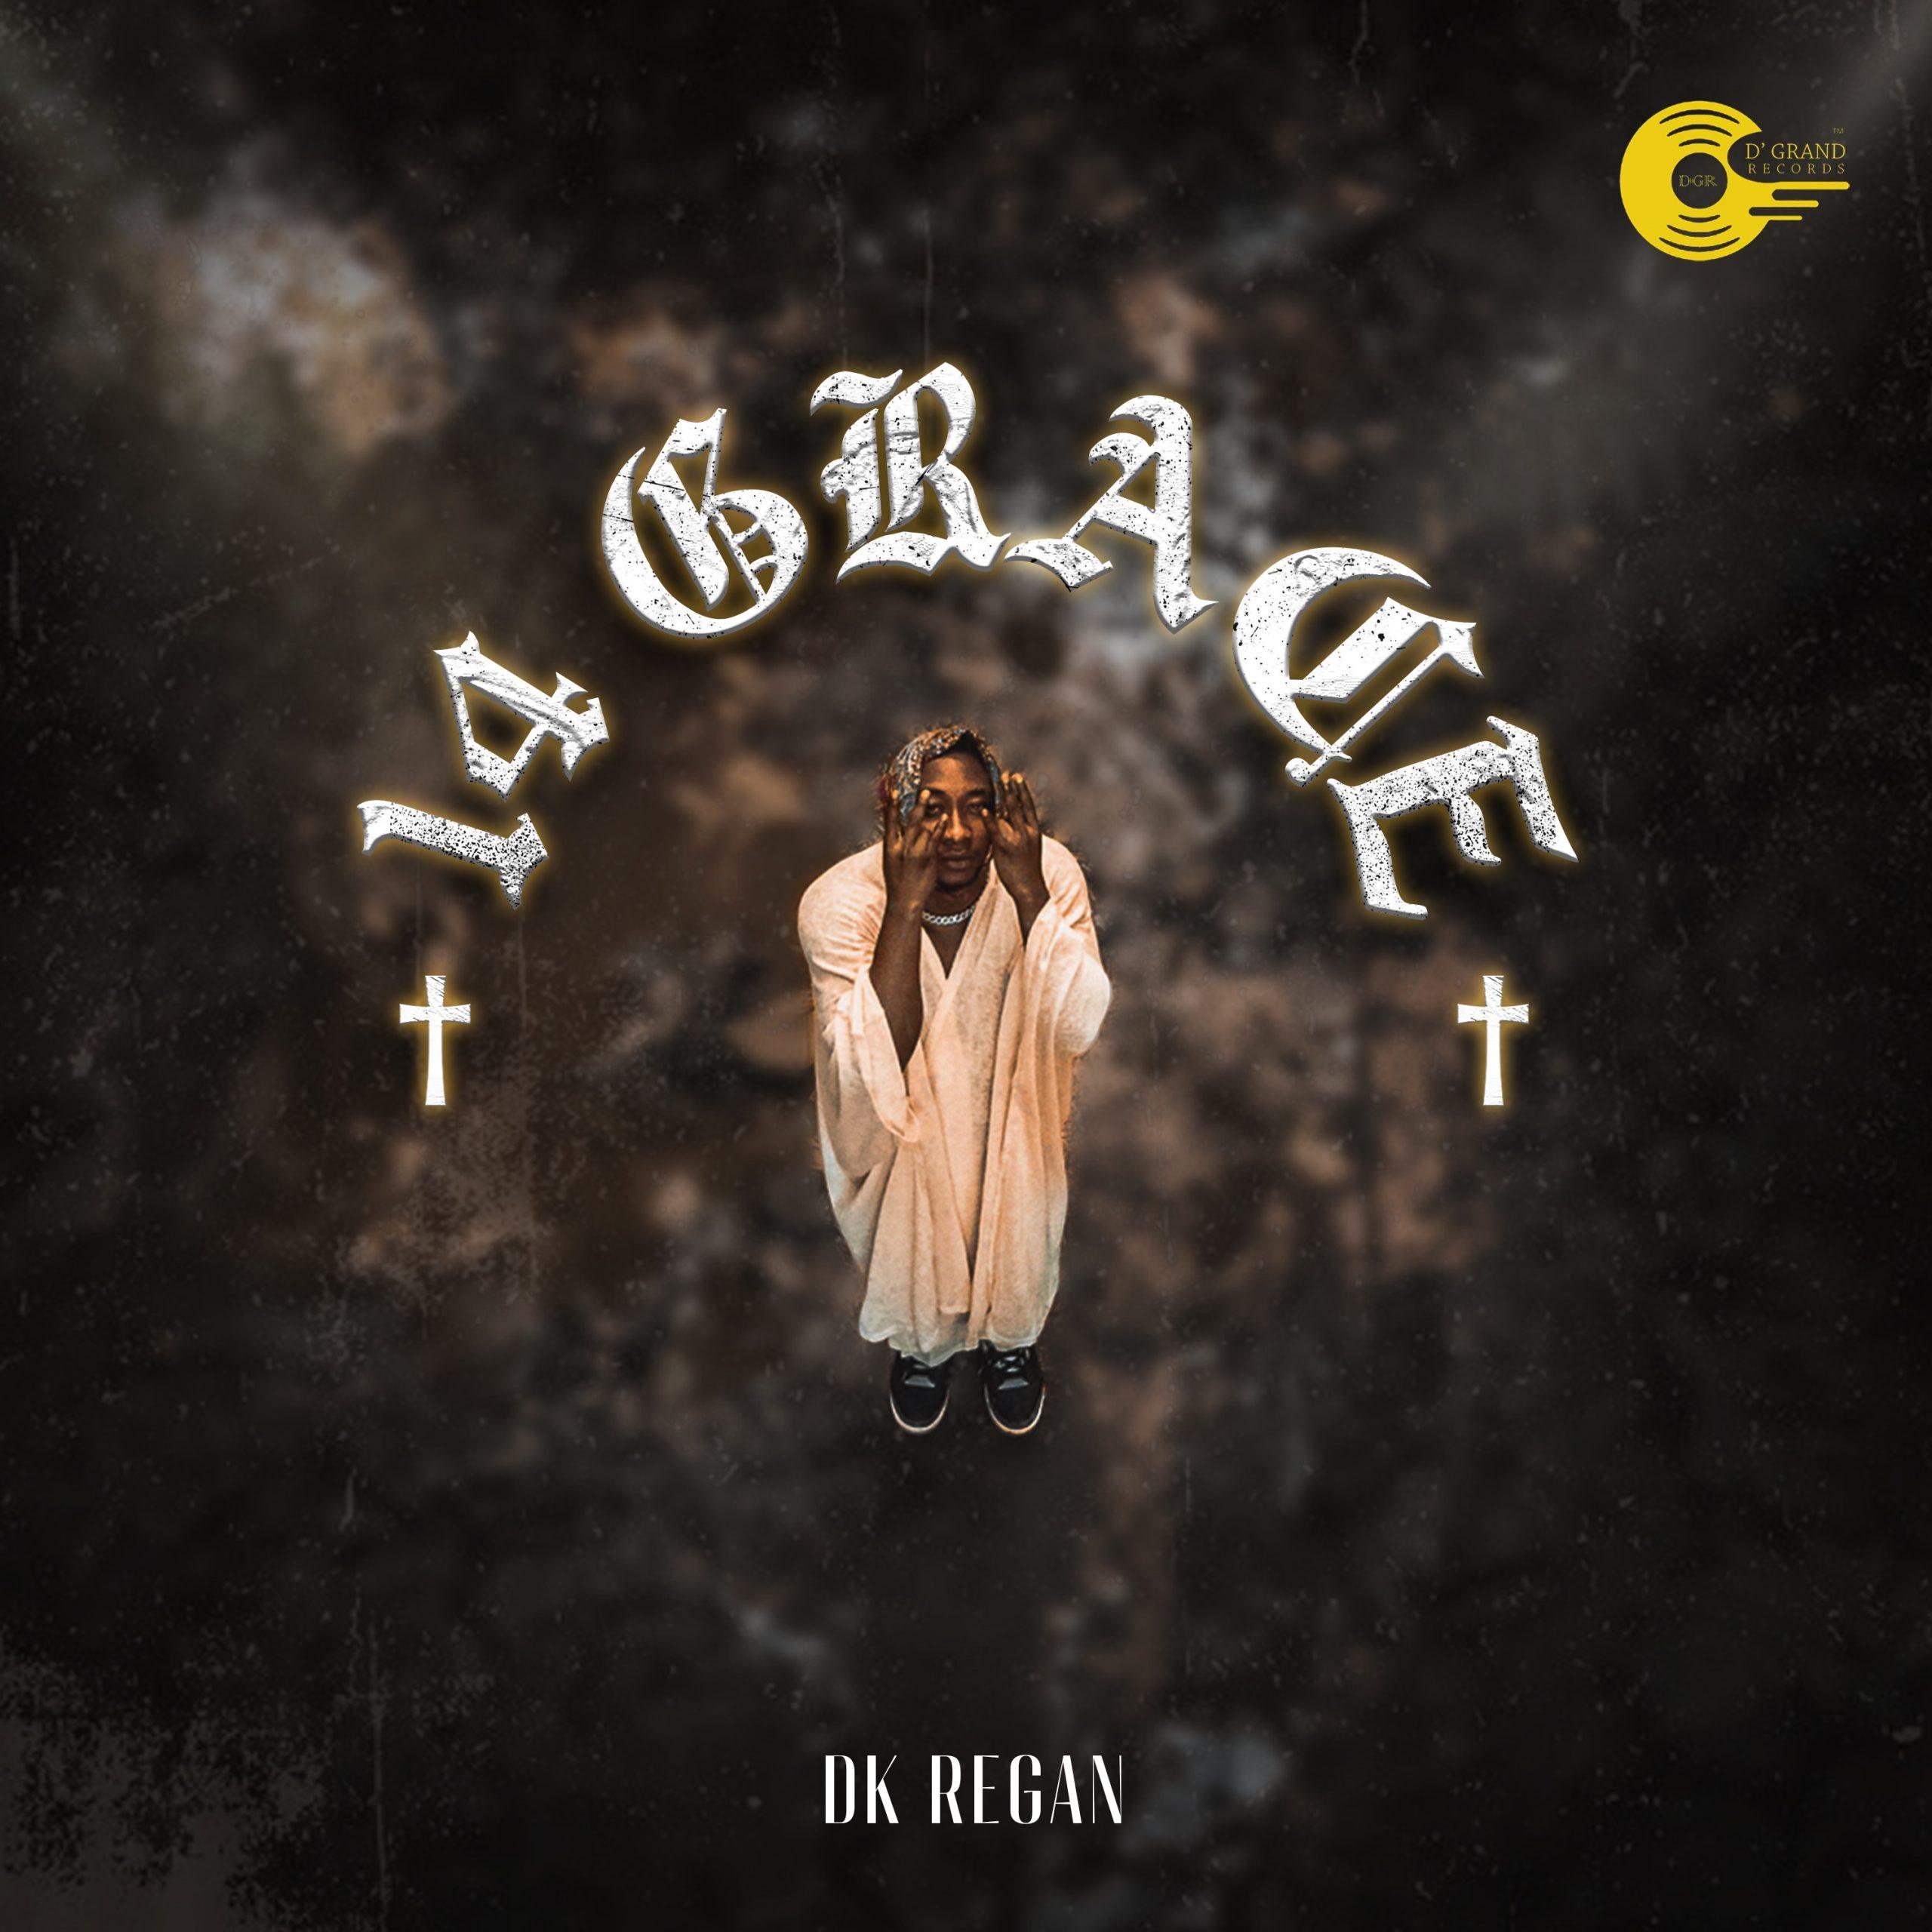 DK REgan - 14 Grace EP